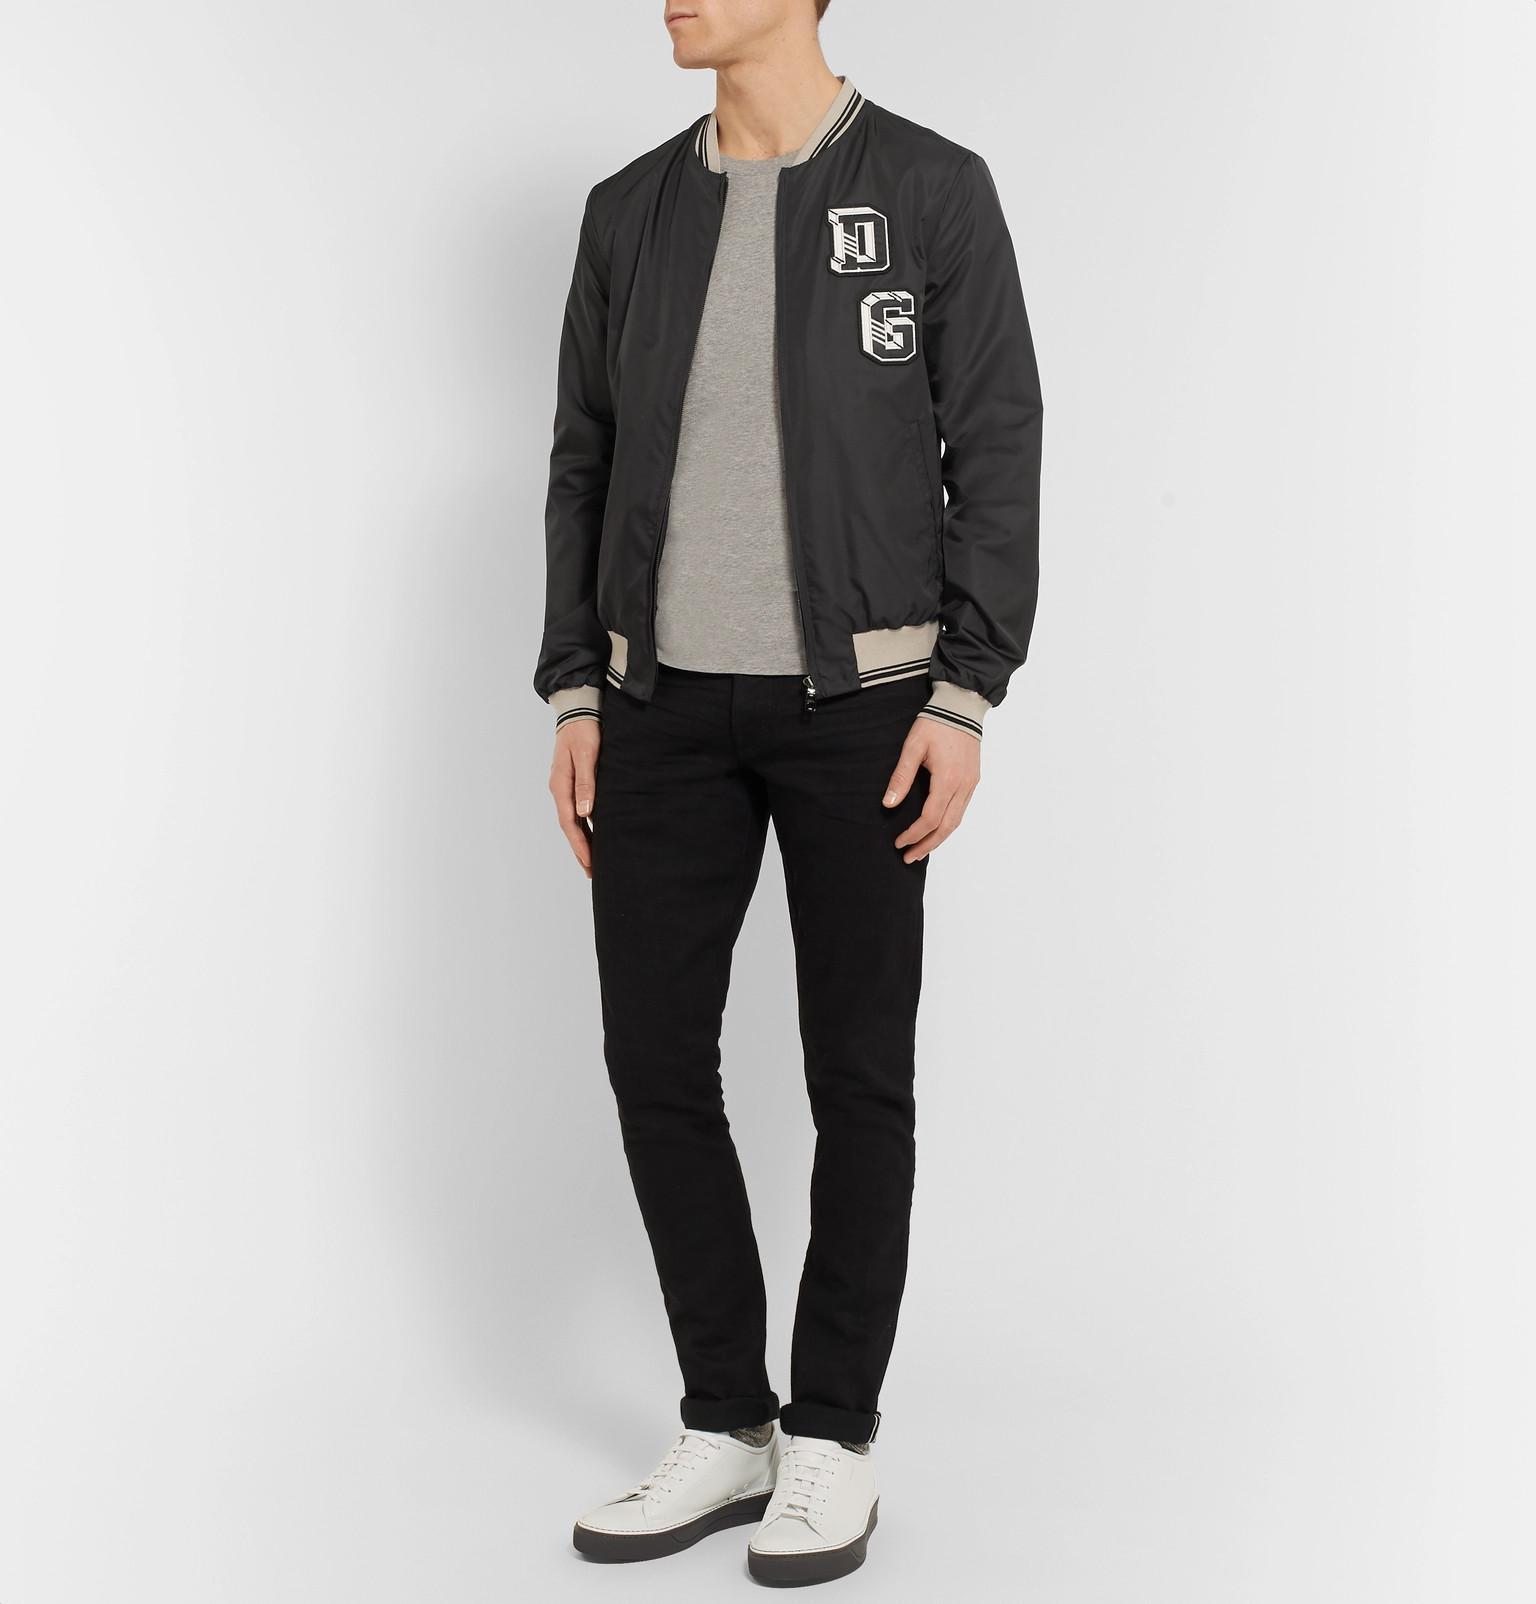 Dolce & Gabbana Denim Appliquéd Shell Bomber Jacket in Black for Men